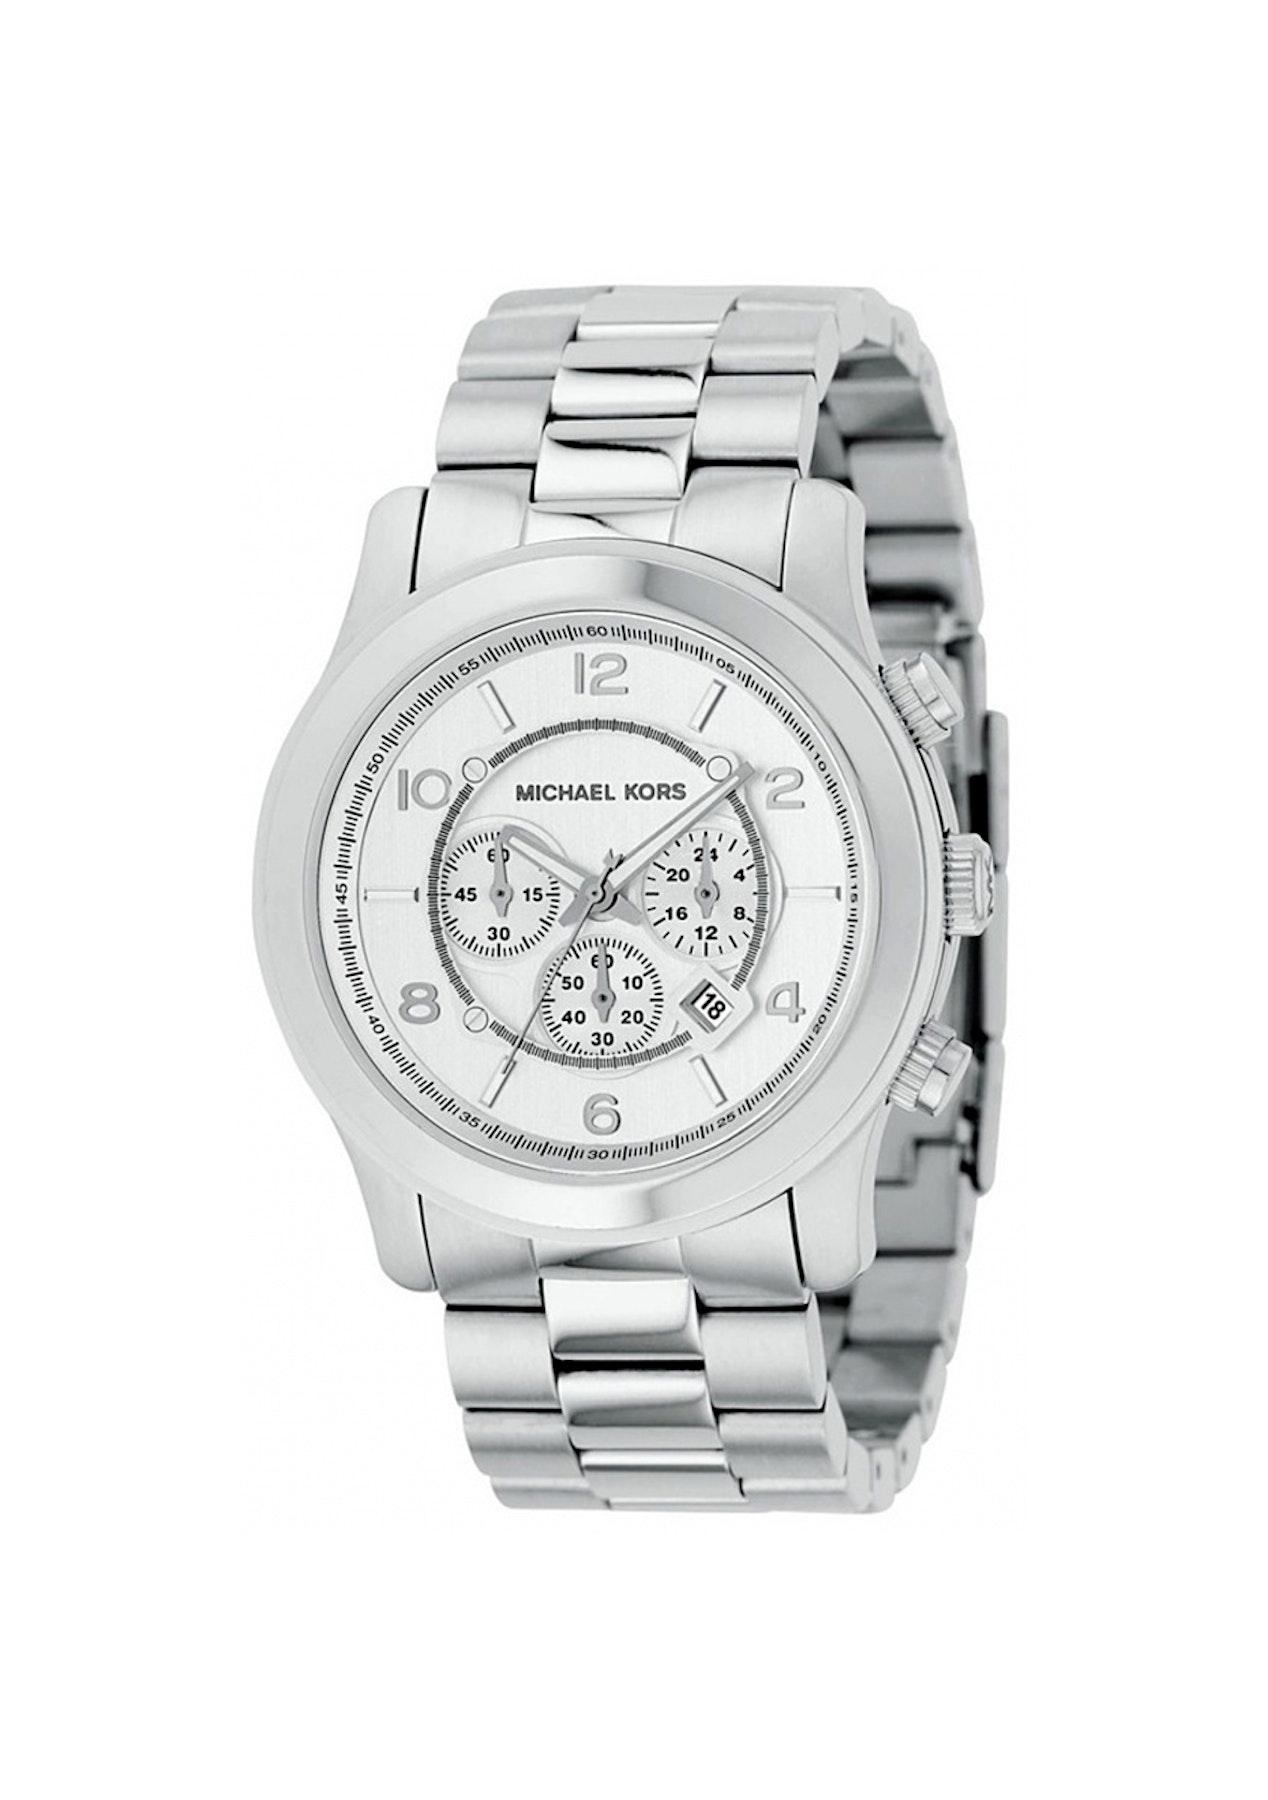 f11e16d60351 Michael Kors Mens Classic - Silver Silver - Marc Jacobs   Michael Kors  Watches - Onceit